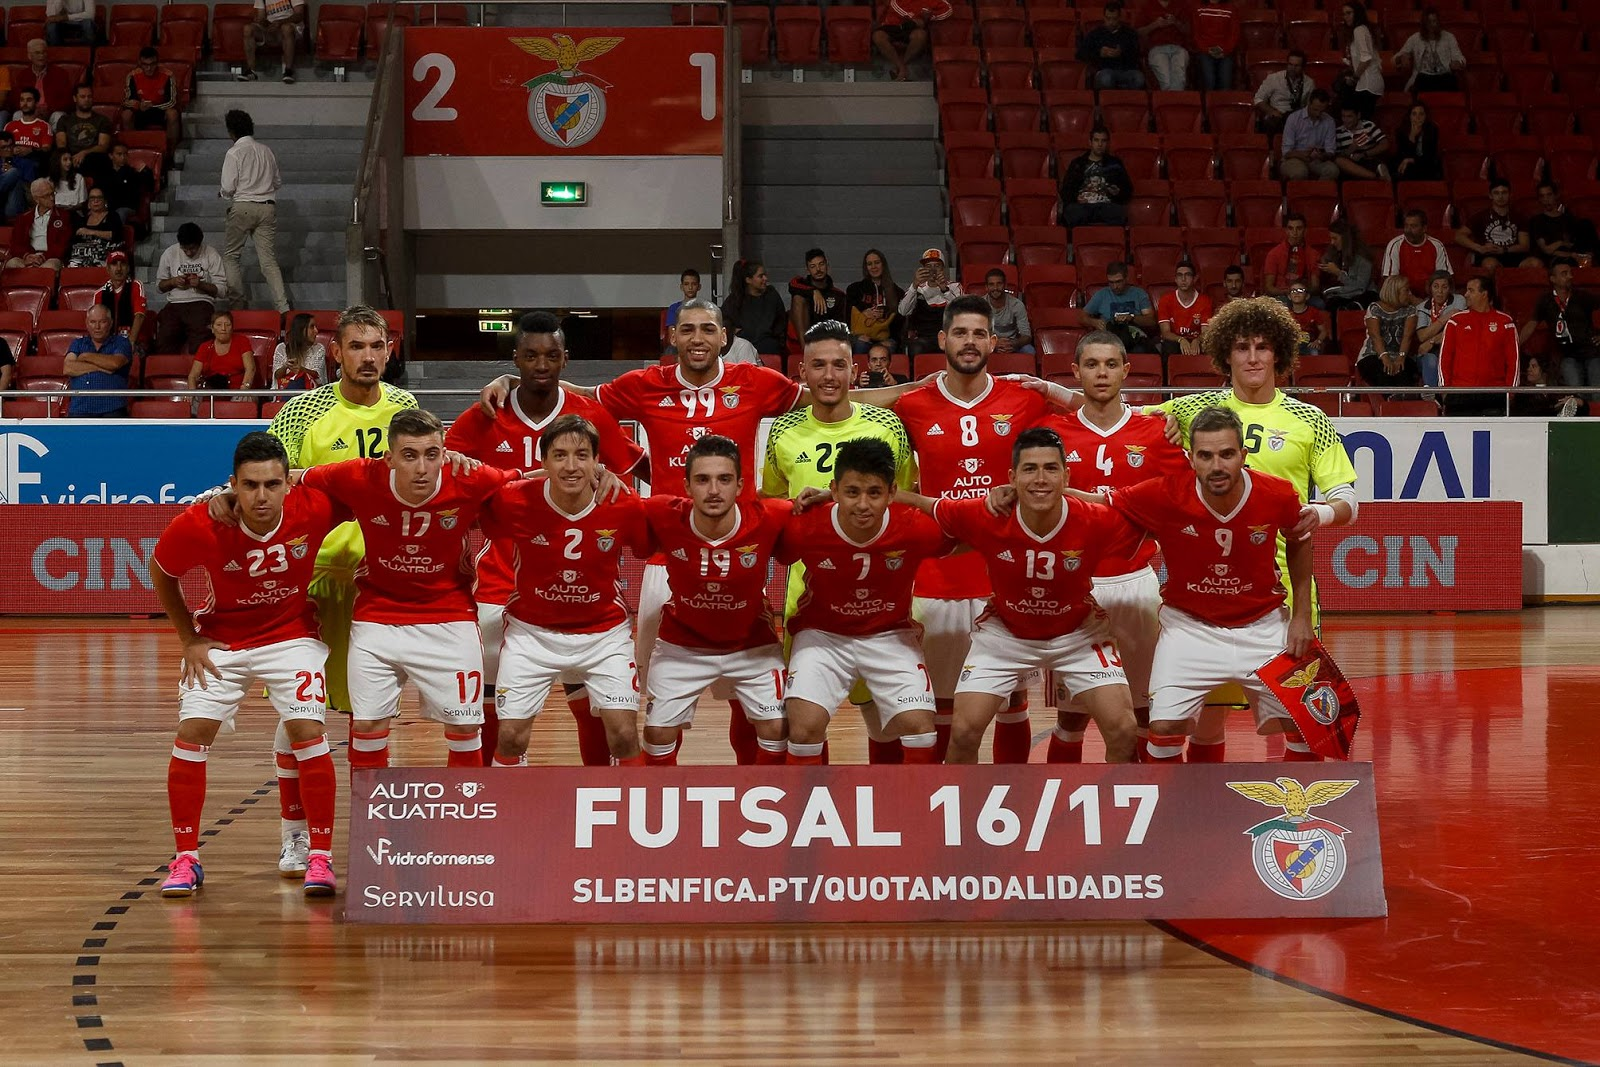 9597b4bcfb Benfica Eclético  Futsal SL Benfica - 2016 2017